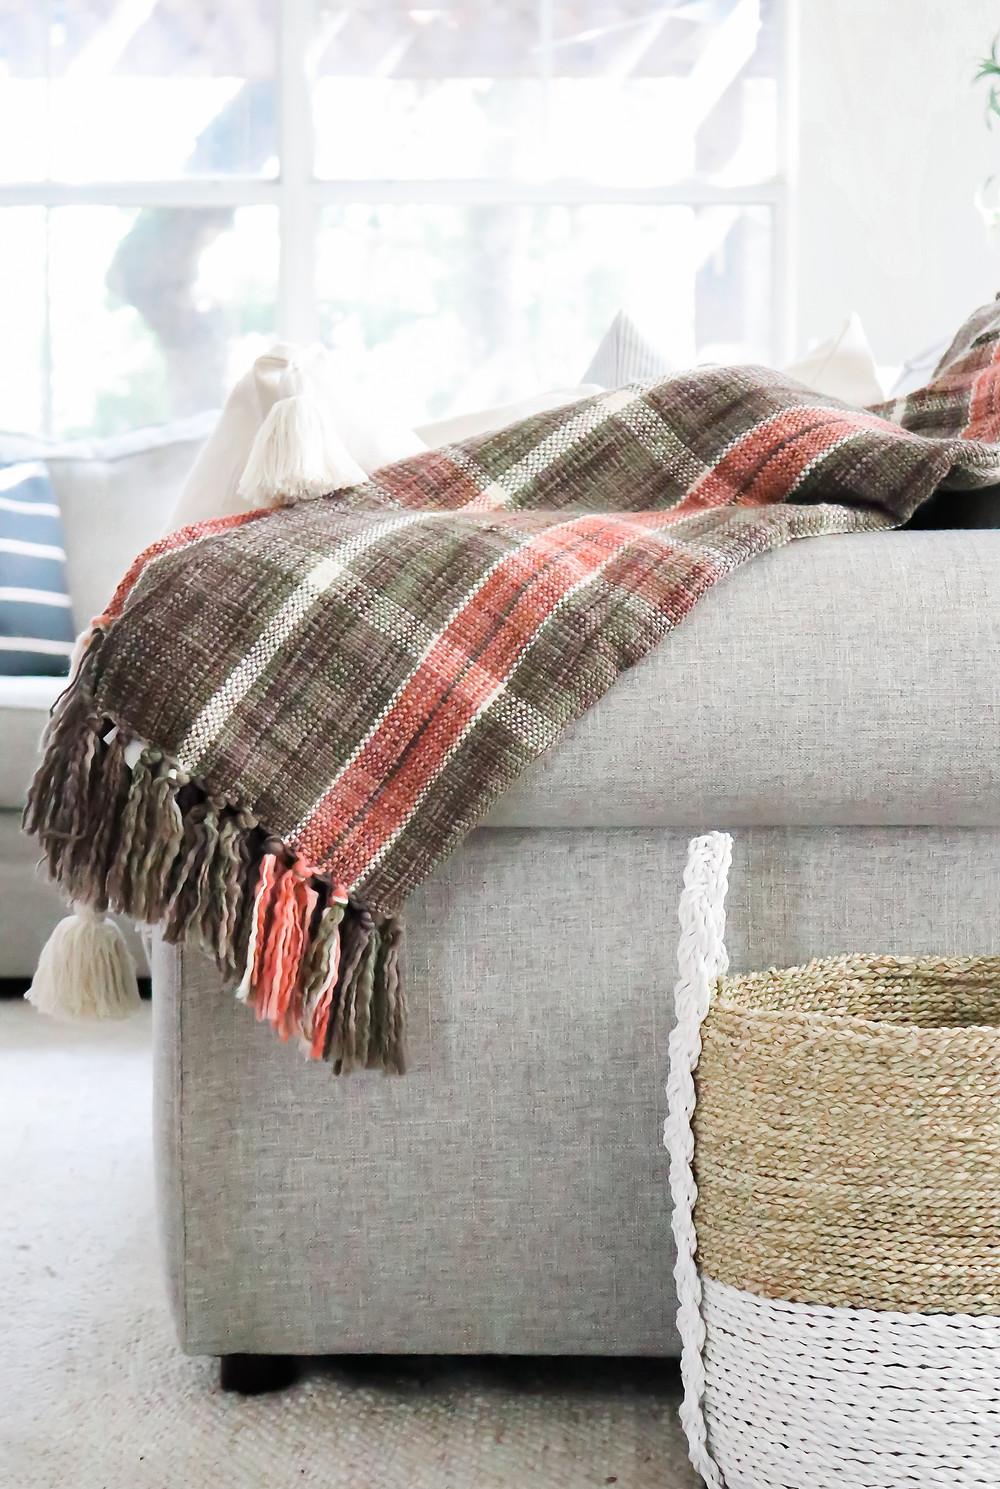 living room design by Laura Design and Co, Flower Mound TX based interior designer